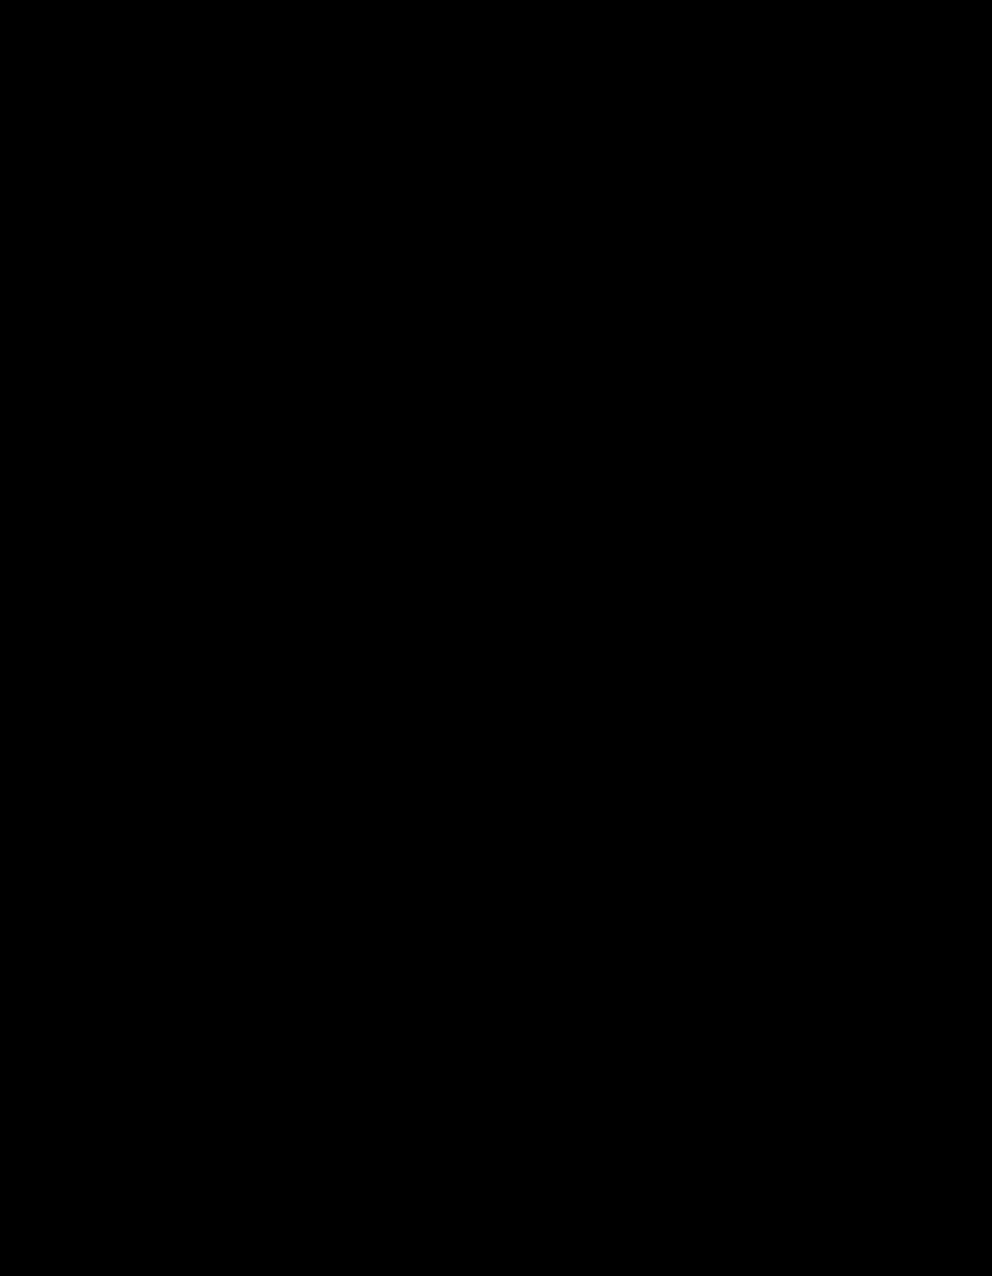 CIL EE